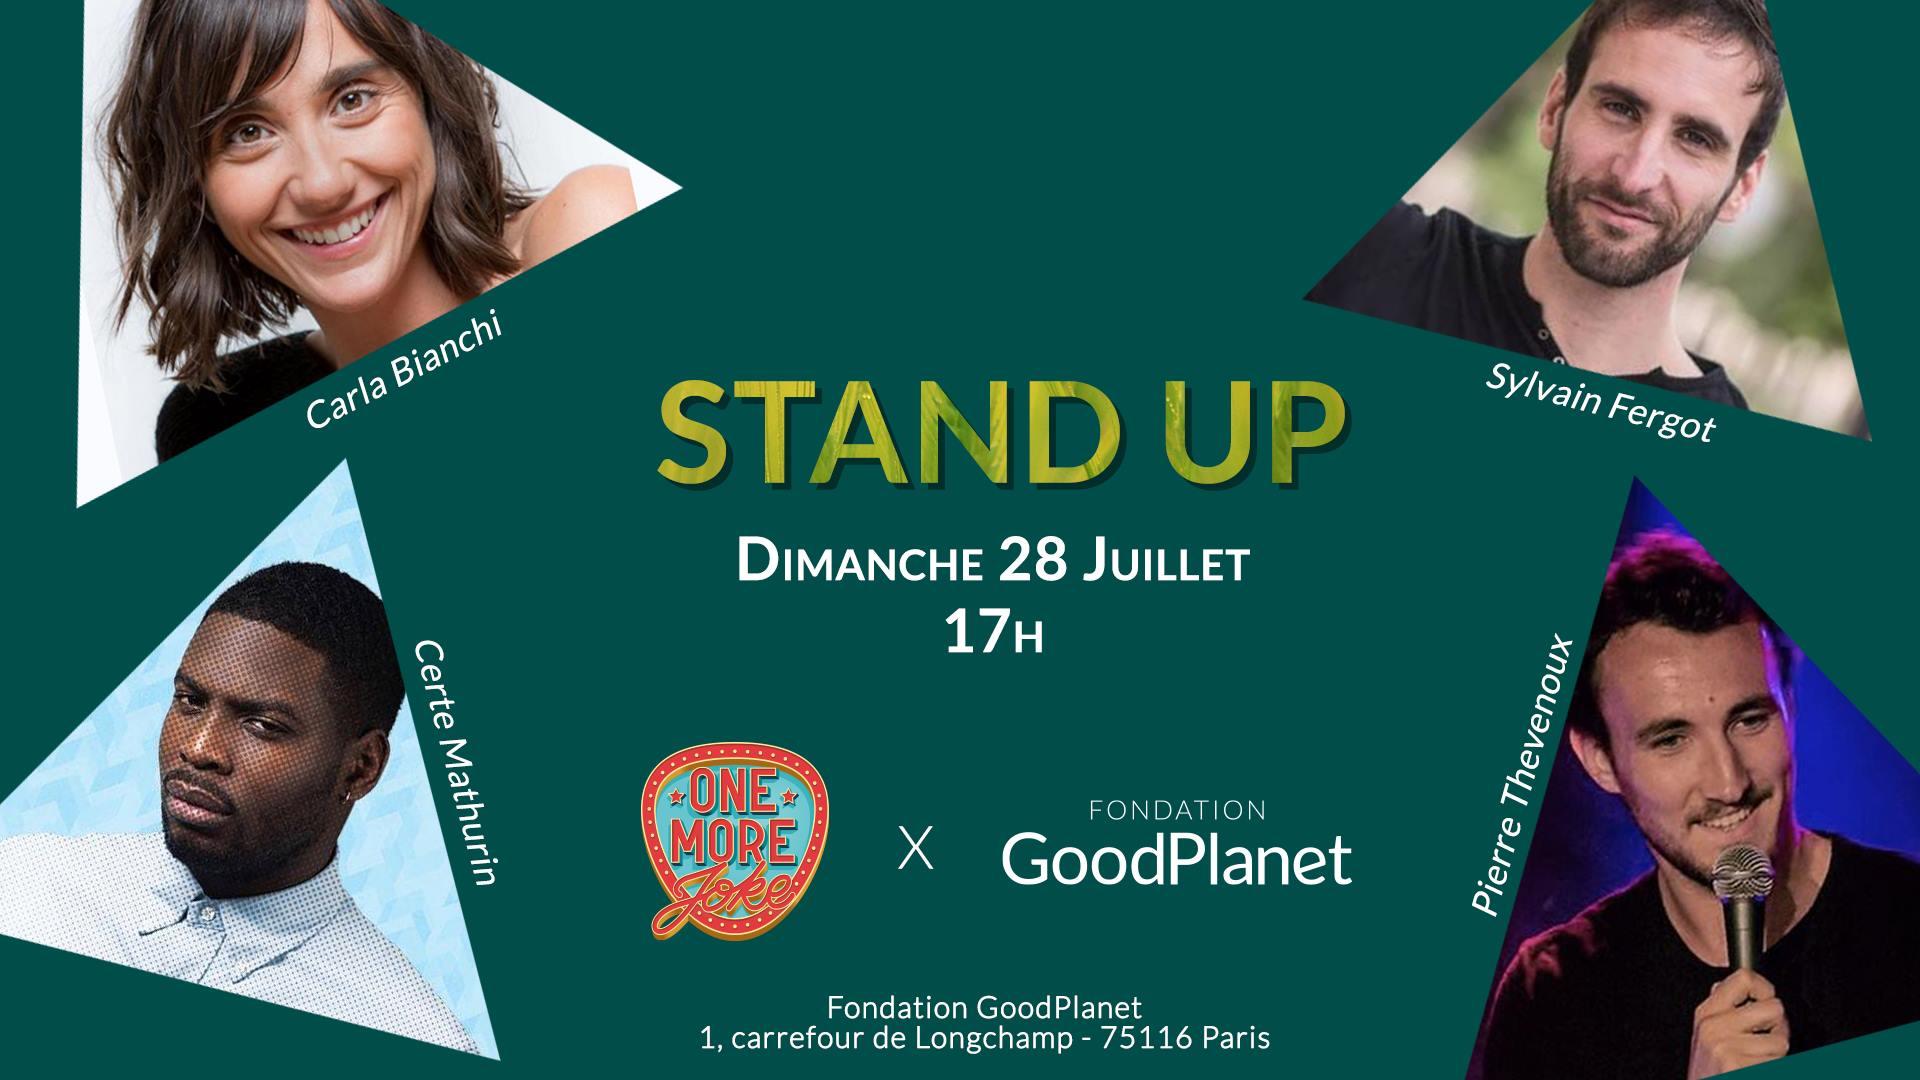 One More Joke : Stand-Up en plein air !